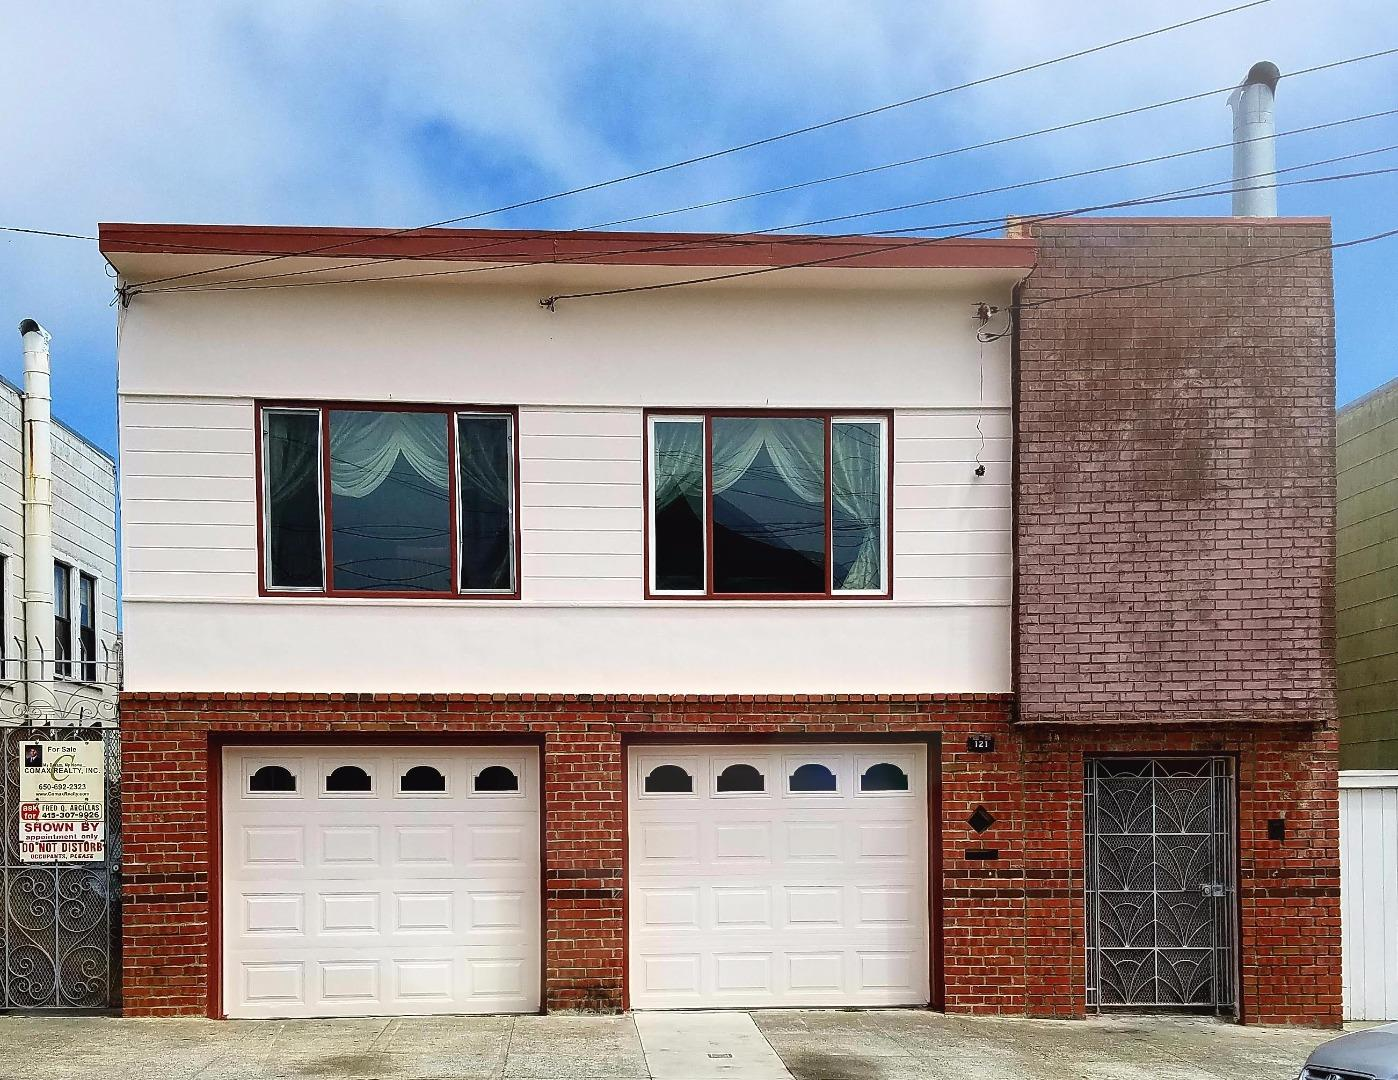 121 Peabody Street, SAN FRANCISCO, CA 94134